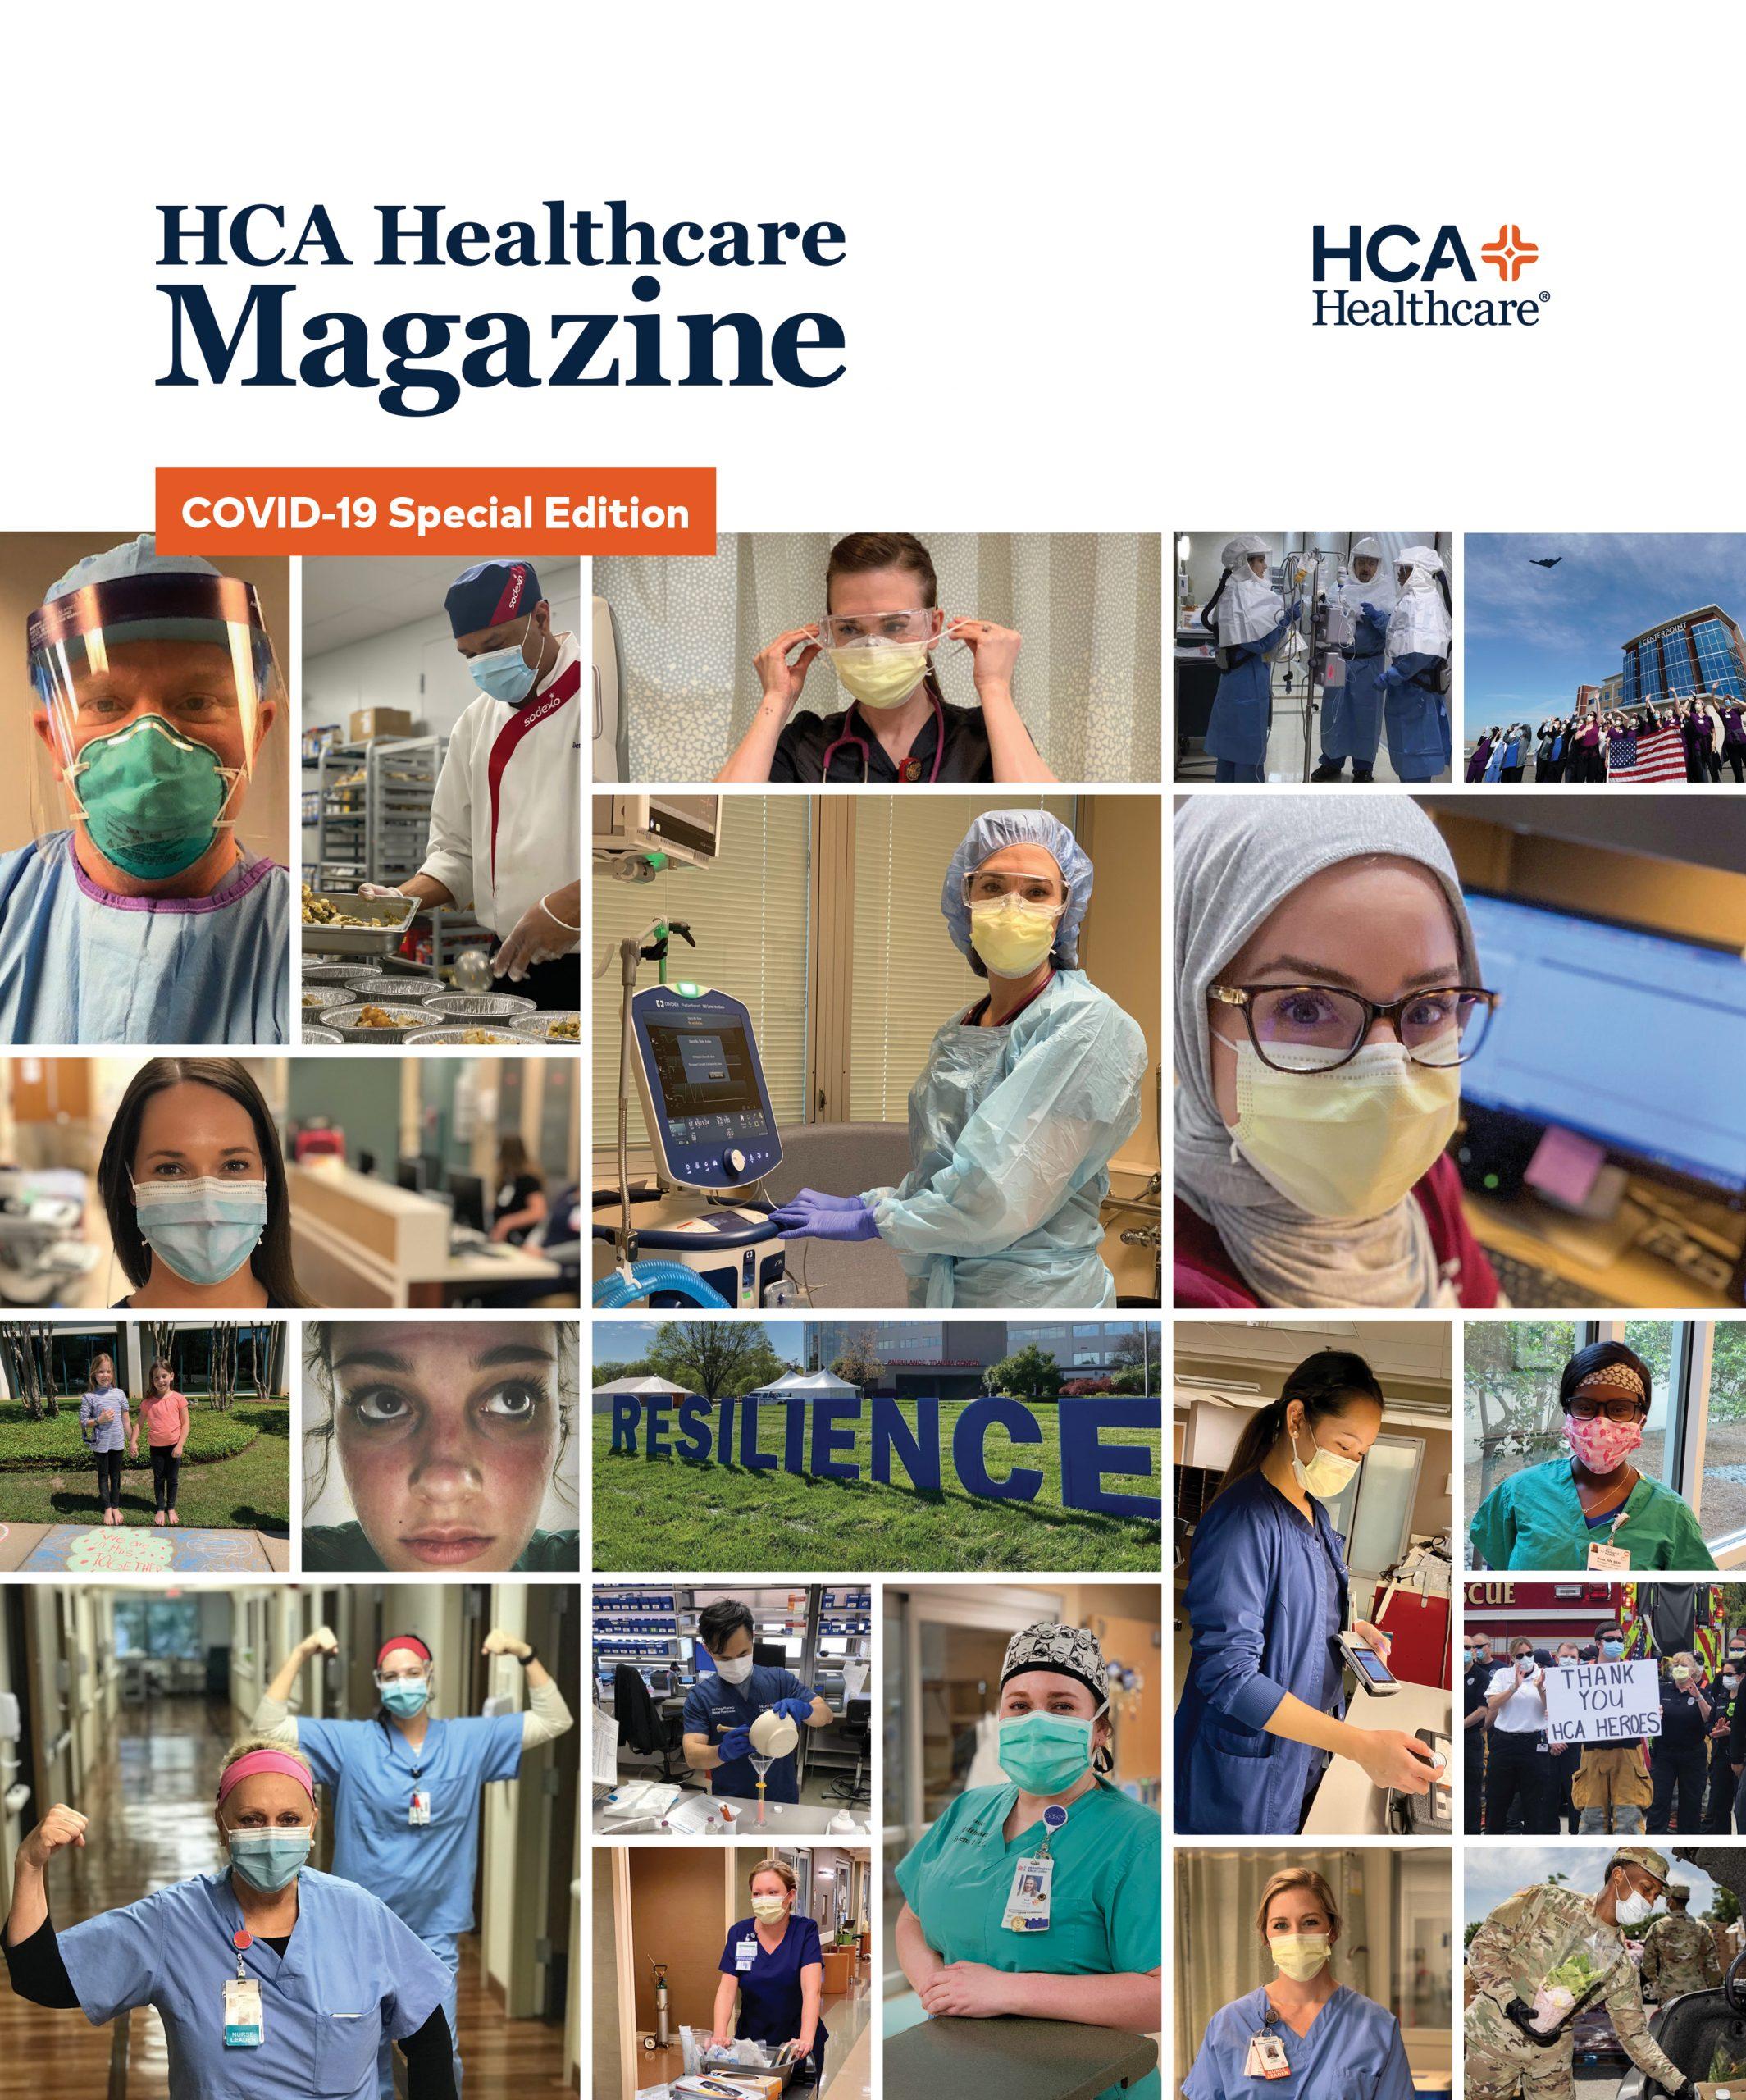 HCA Healthcare Magazine Summer 2020 issue cover